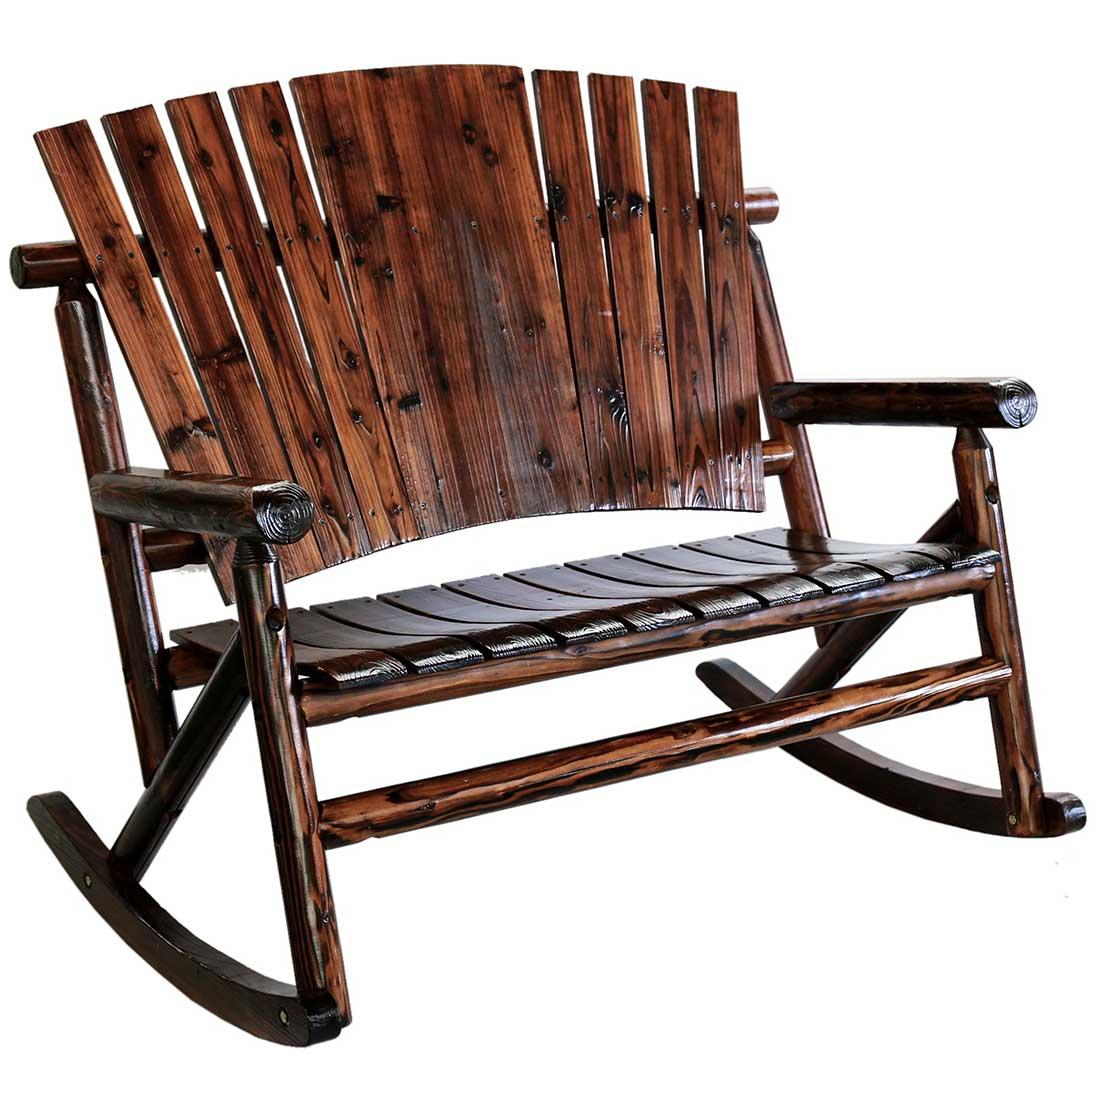 Strange Char Log Wooden Double Rocker Unemploymentrelief Wooden Chair Designs For Living Room Unemploymentrelieforg